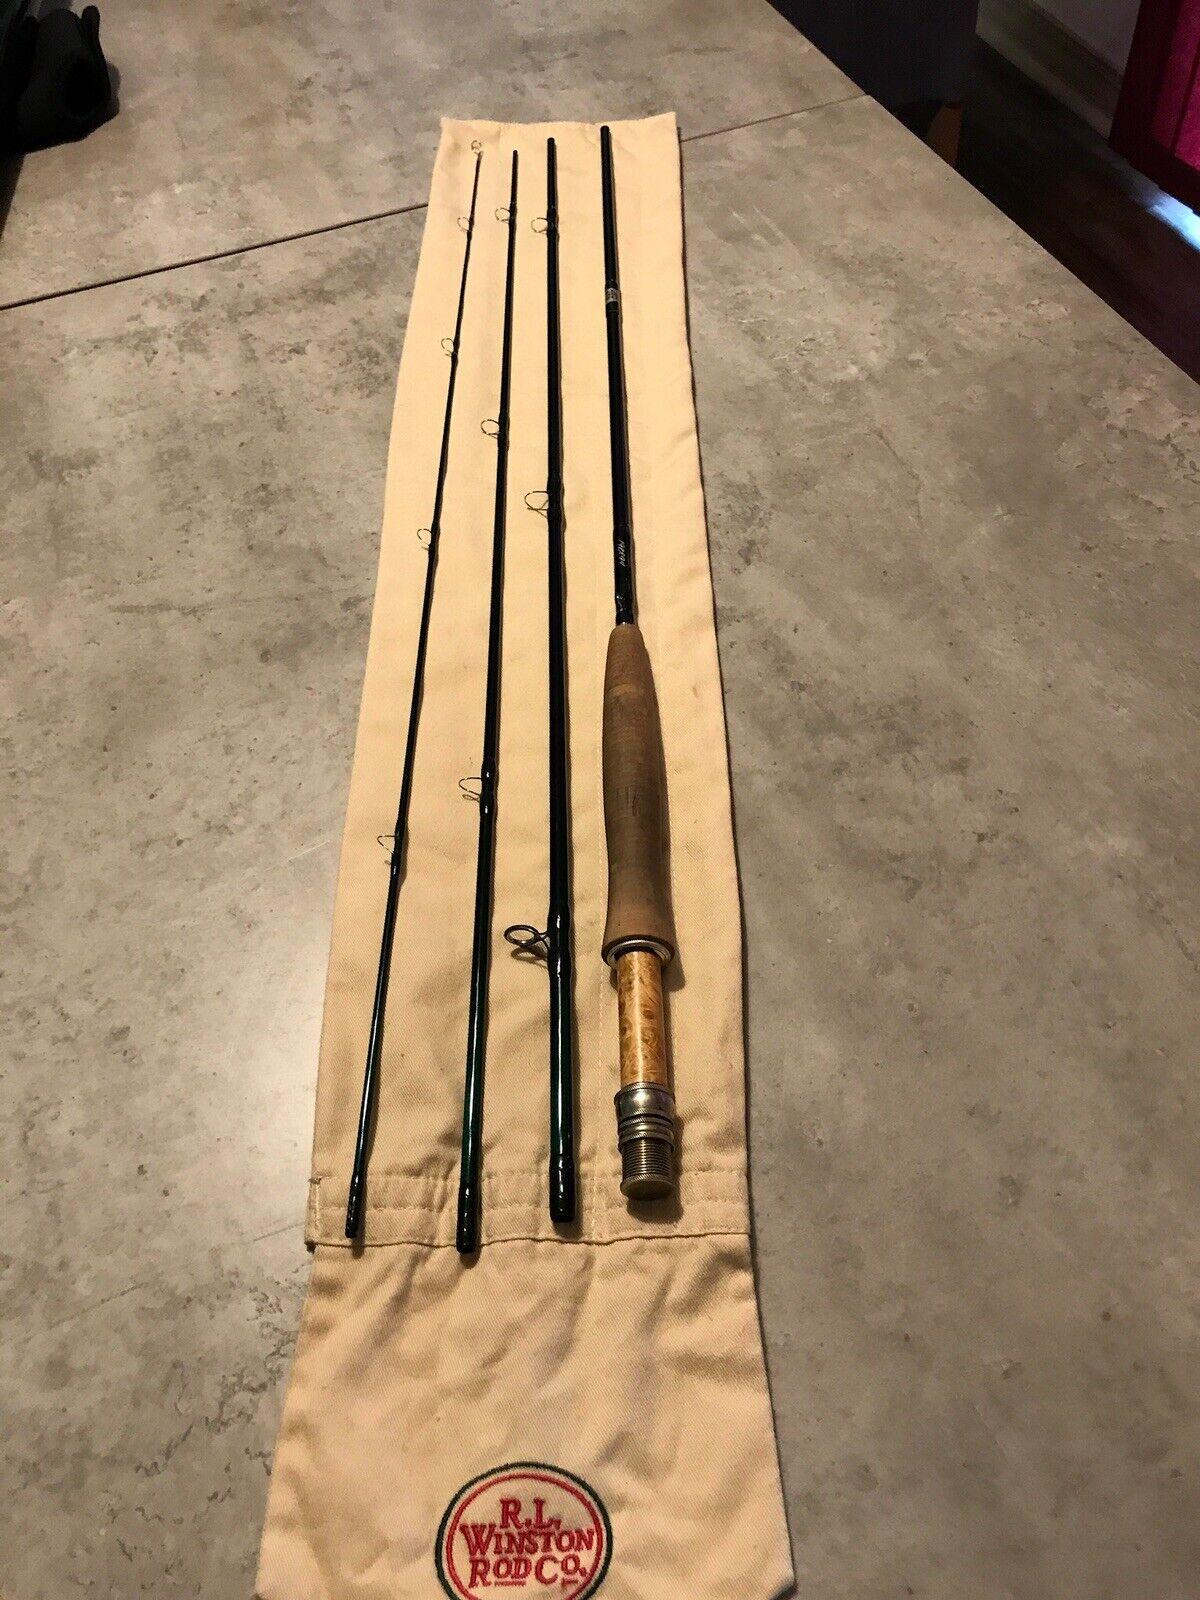 Winston Boron IIIX 9' 5wt 4pc Fly Rod + Extras